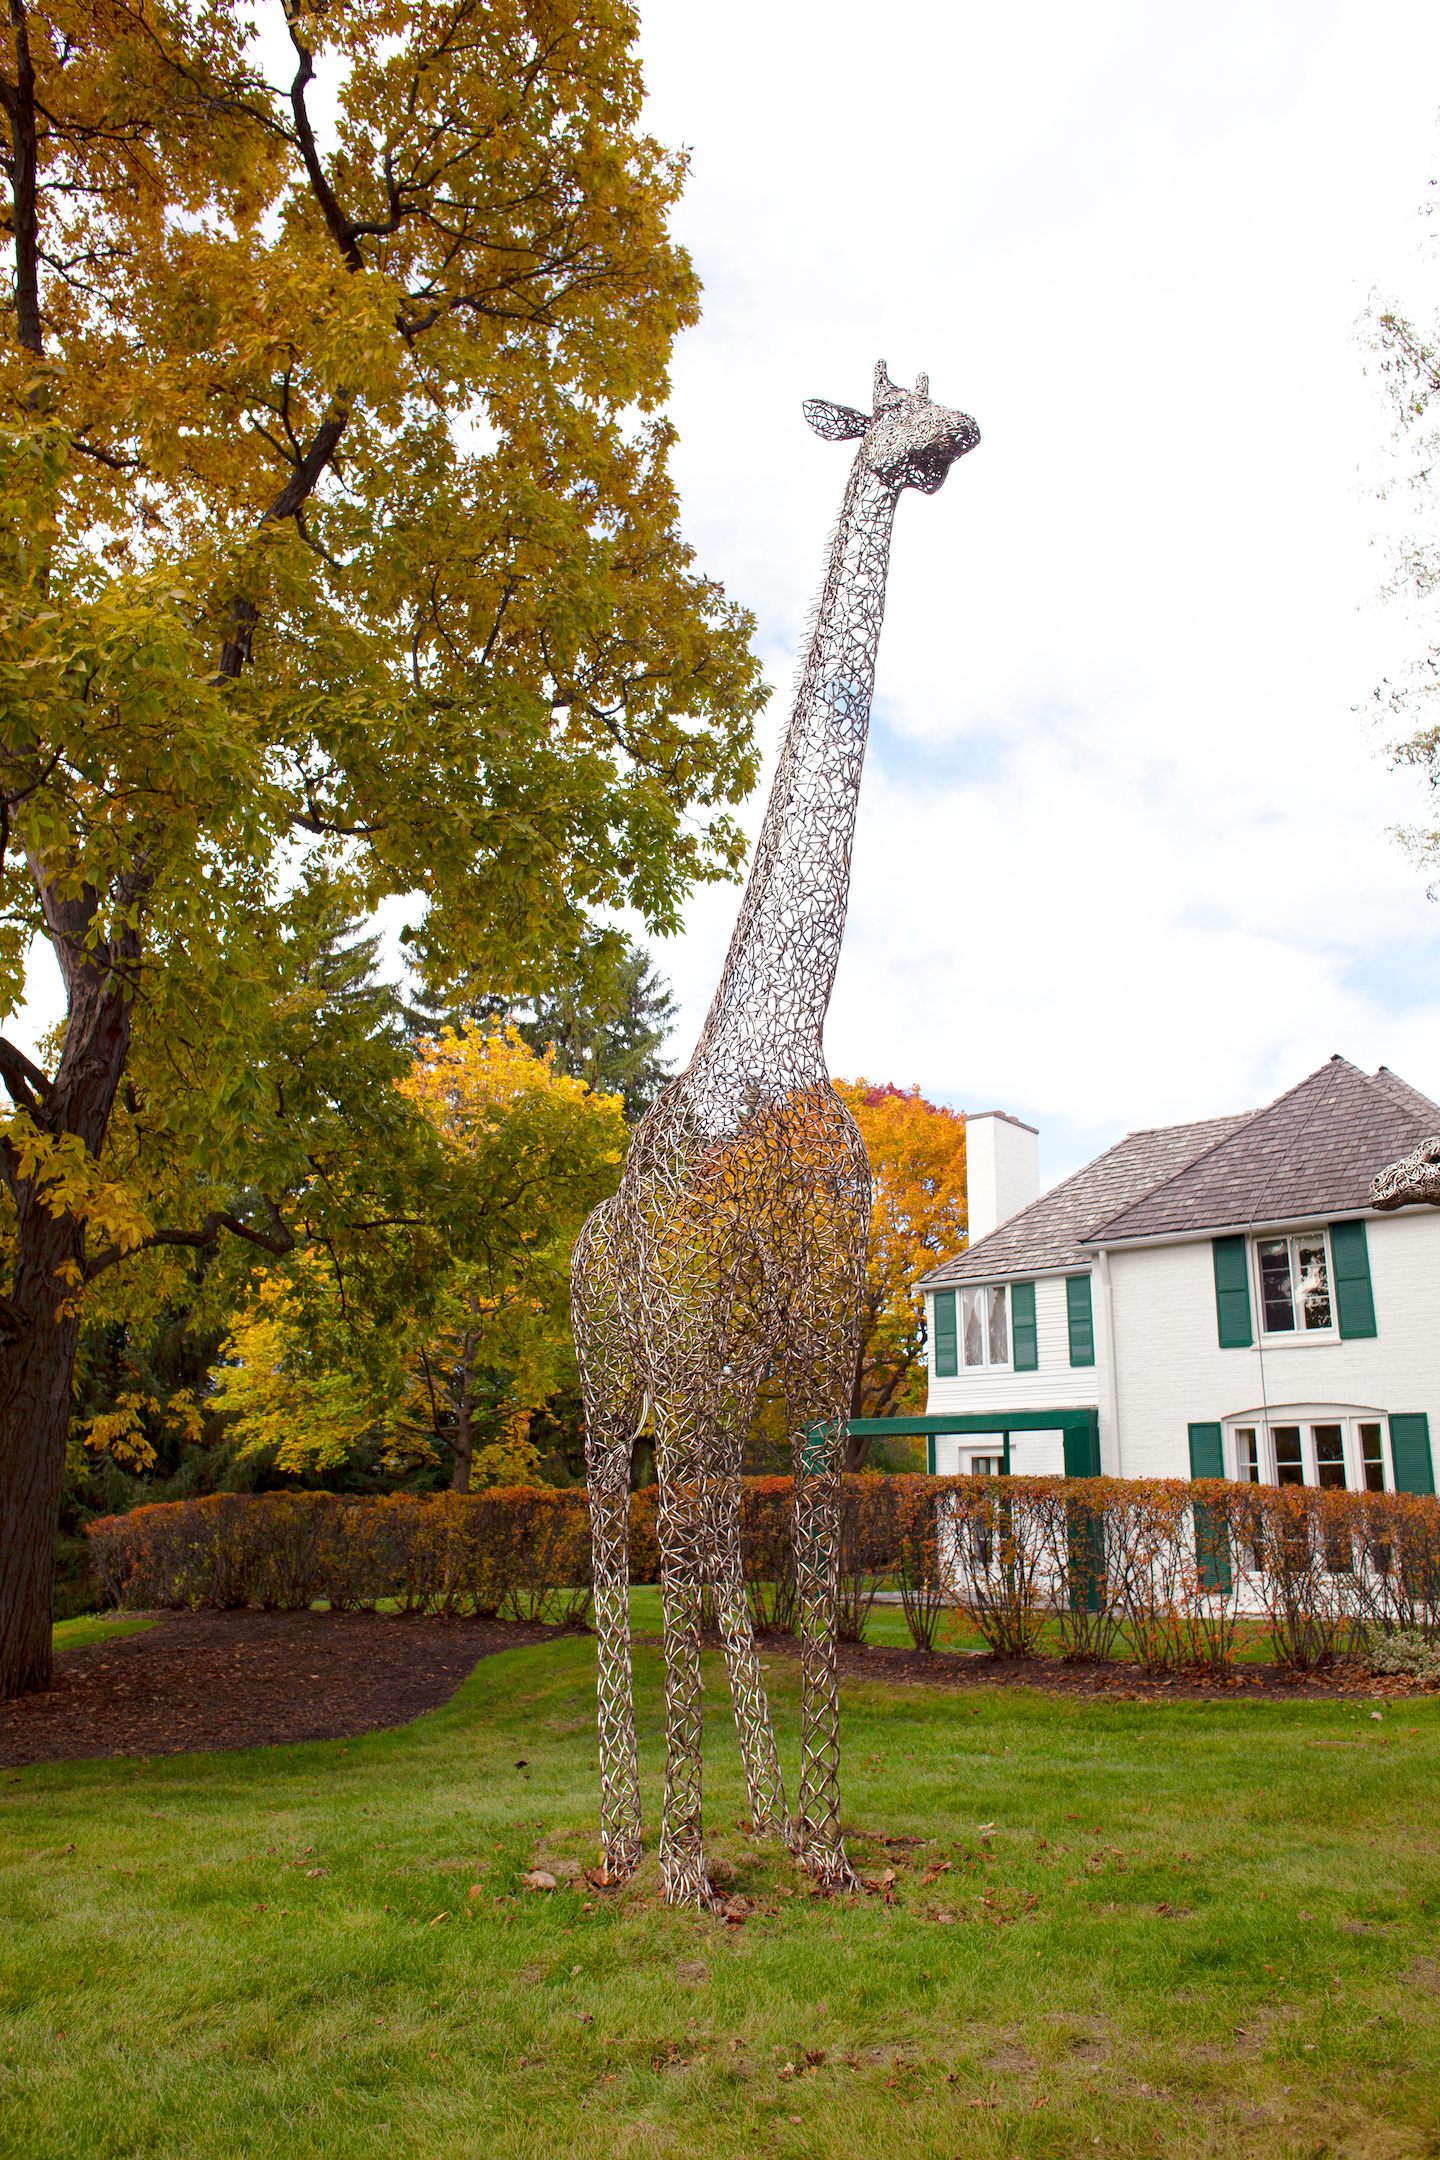 The Giraffe Project